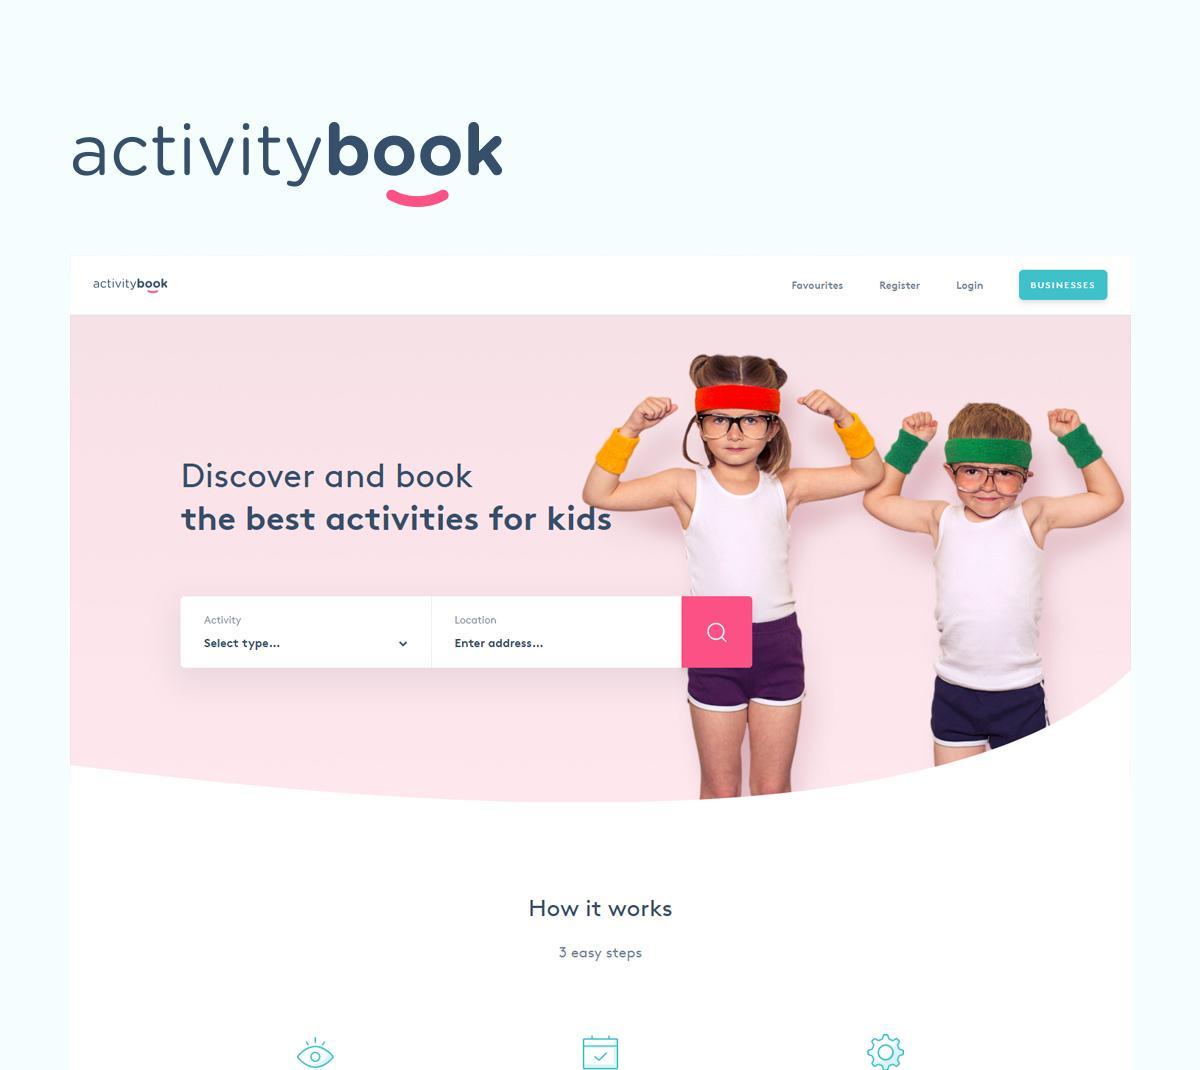 Cocolabs_images_portfolio_ActivityBook-small-02.jpg